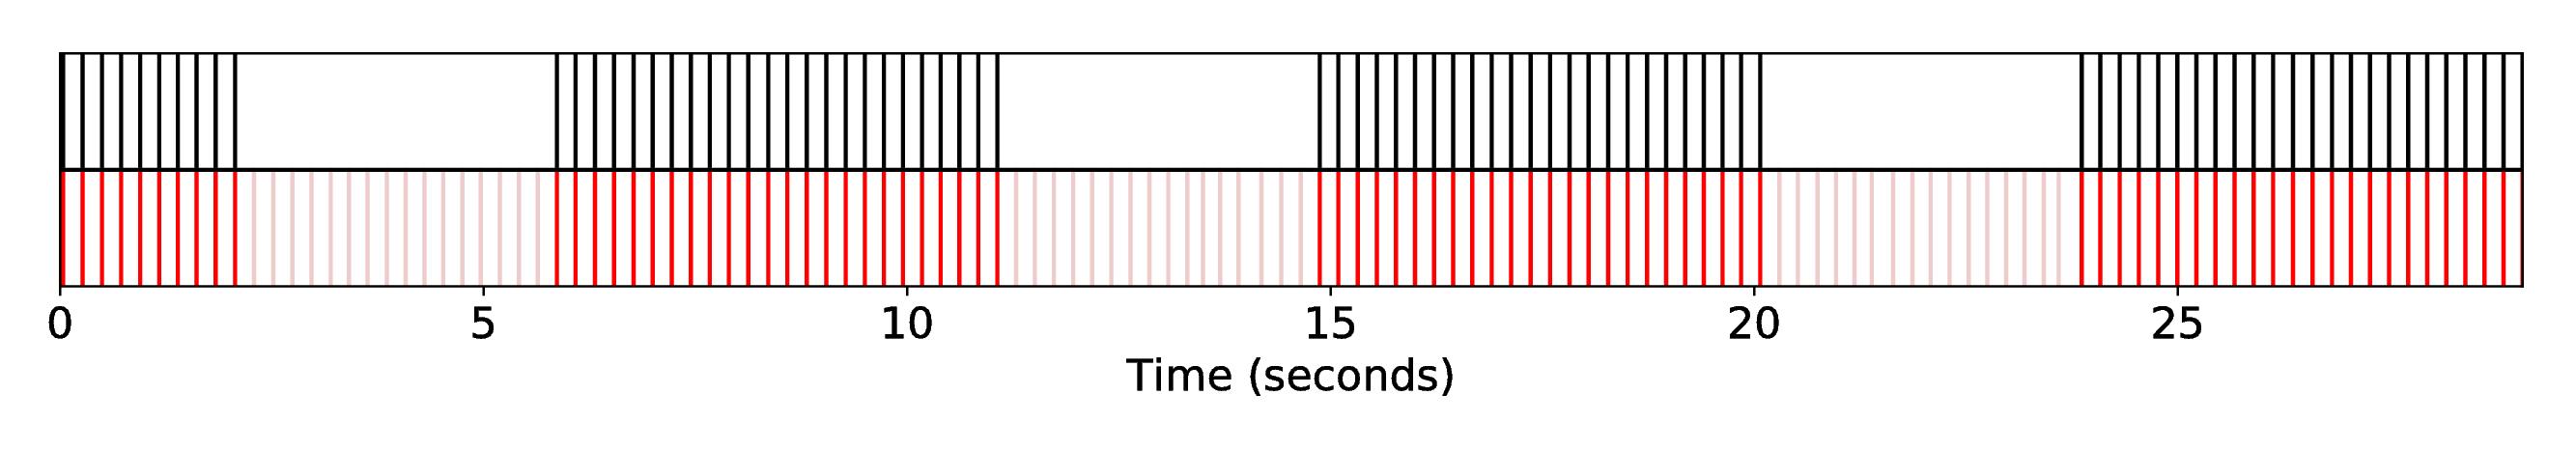 DP1_INT1_R-MRI-06__S-Silence__SequenceAlignment